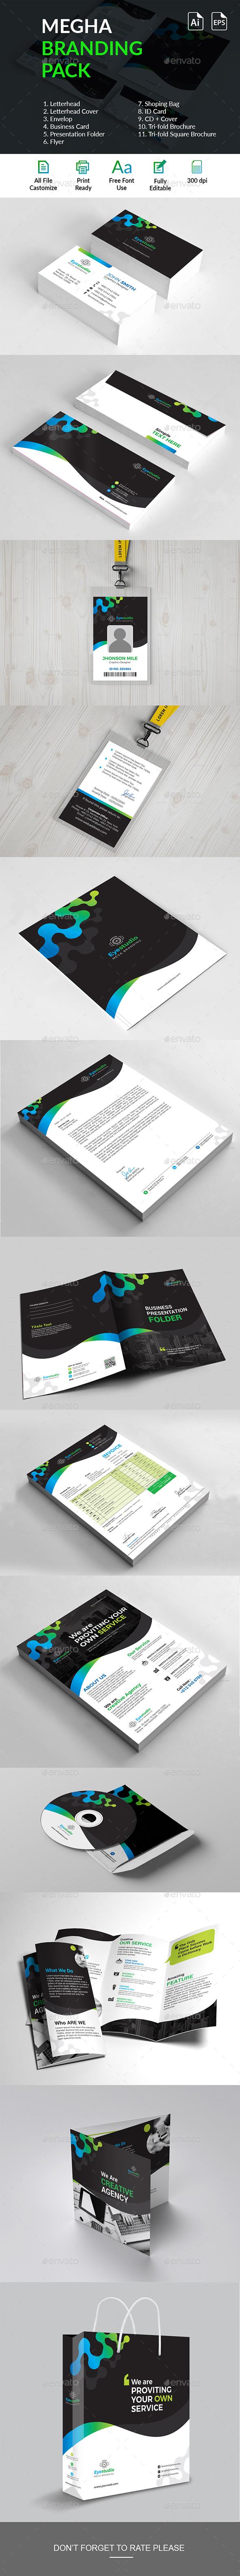 Mega Branding Identity - Stationery Print Templates